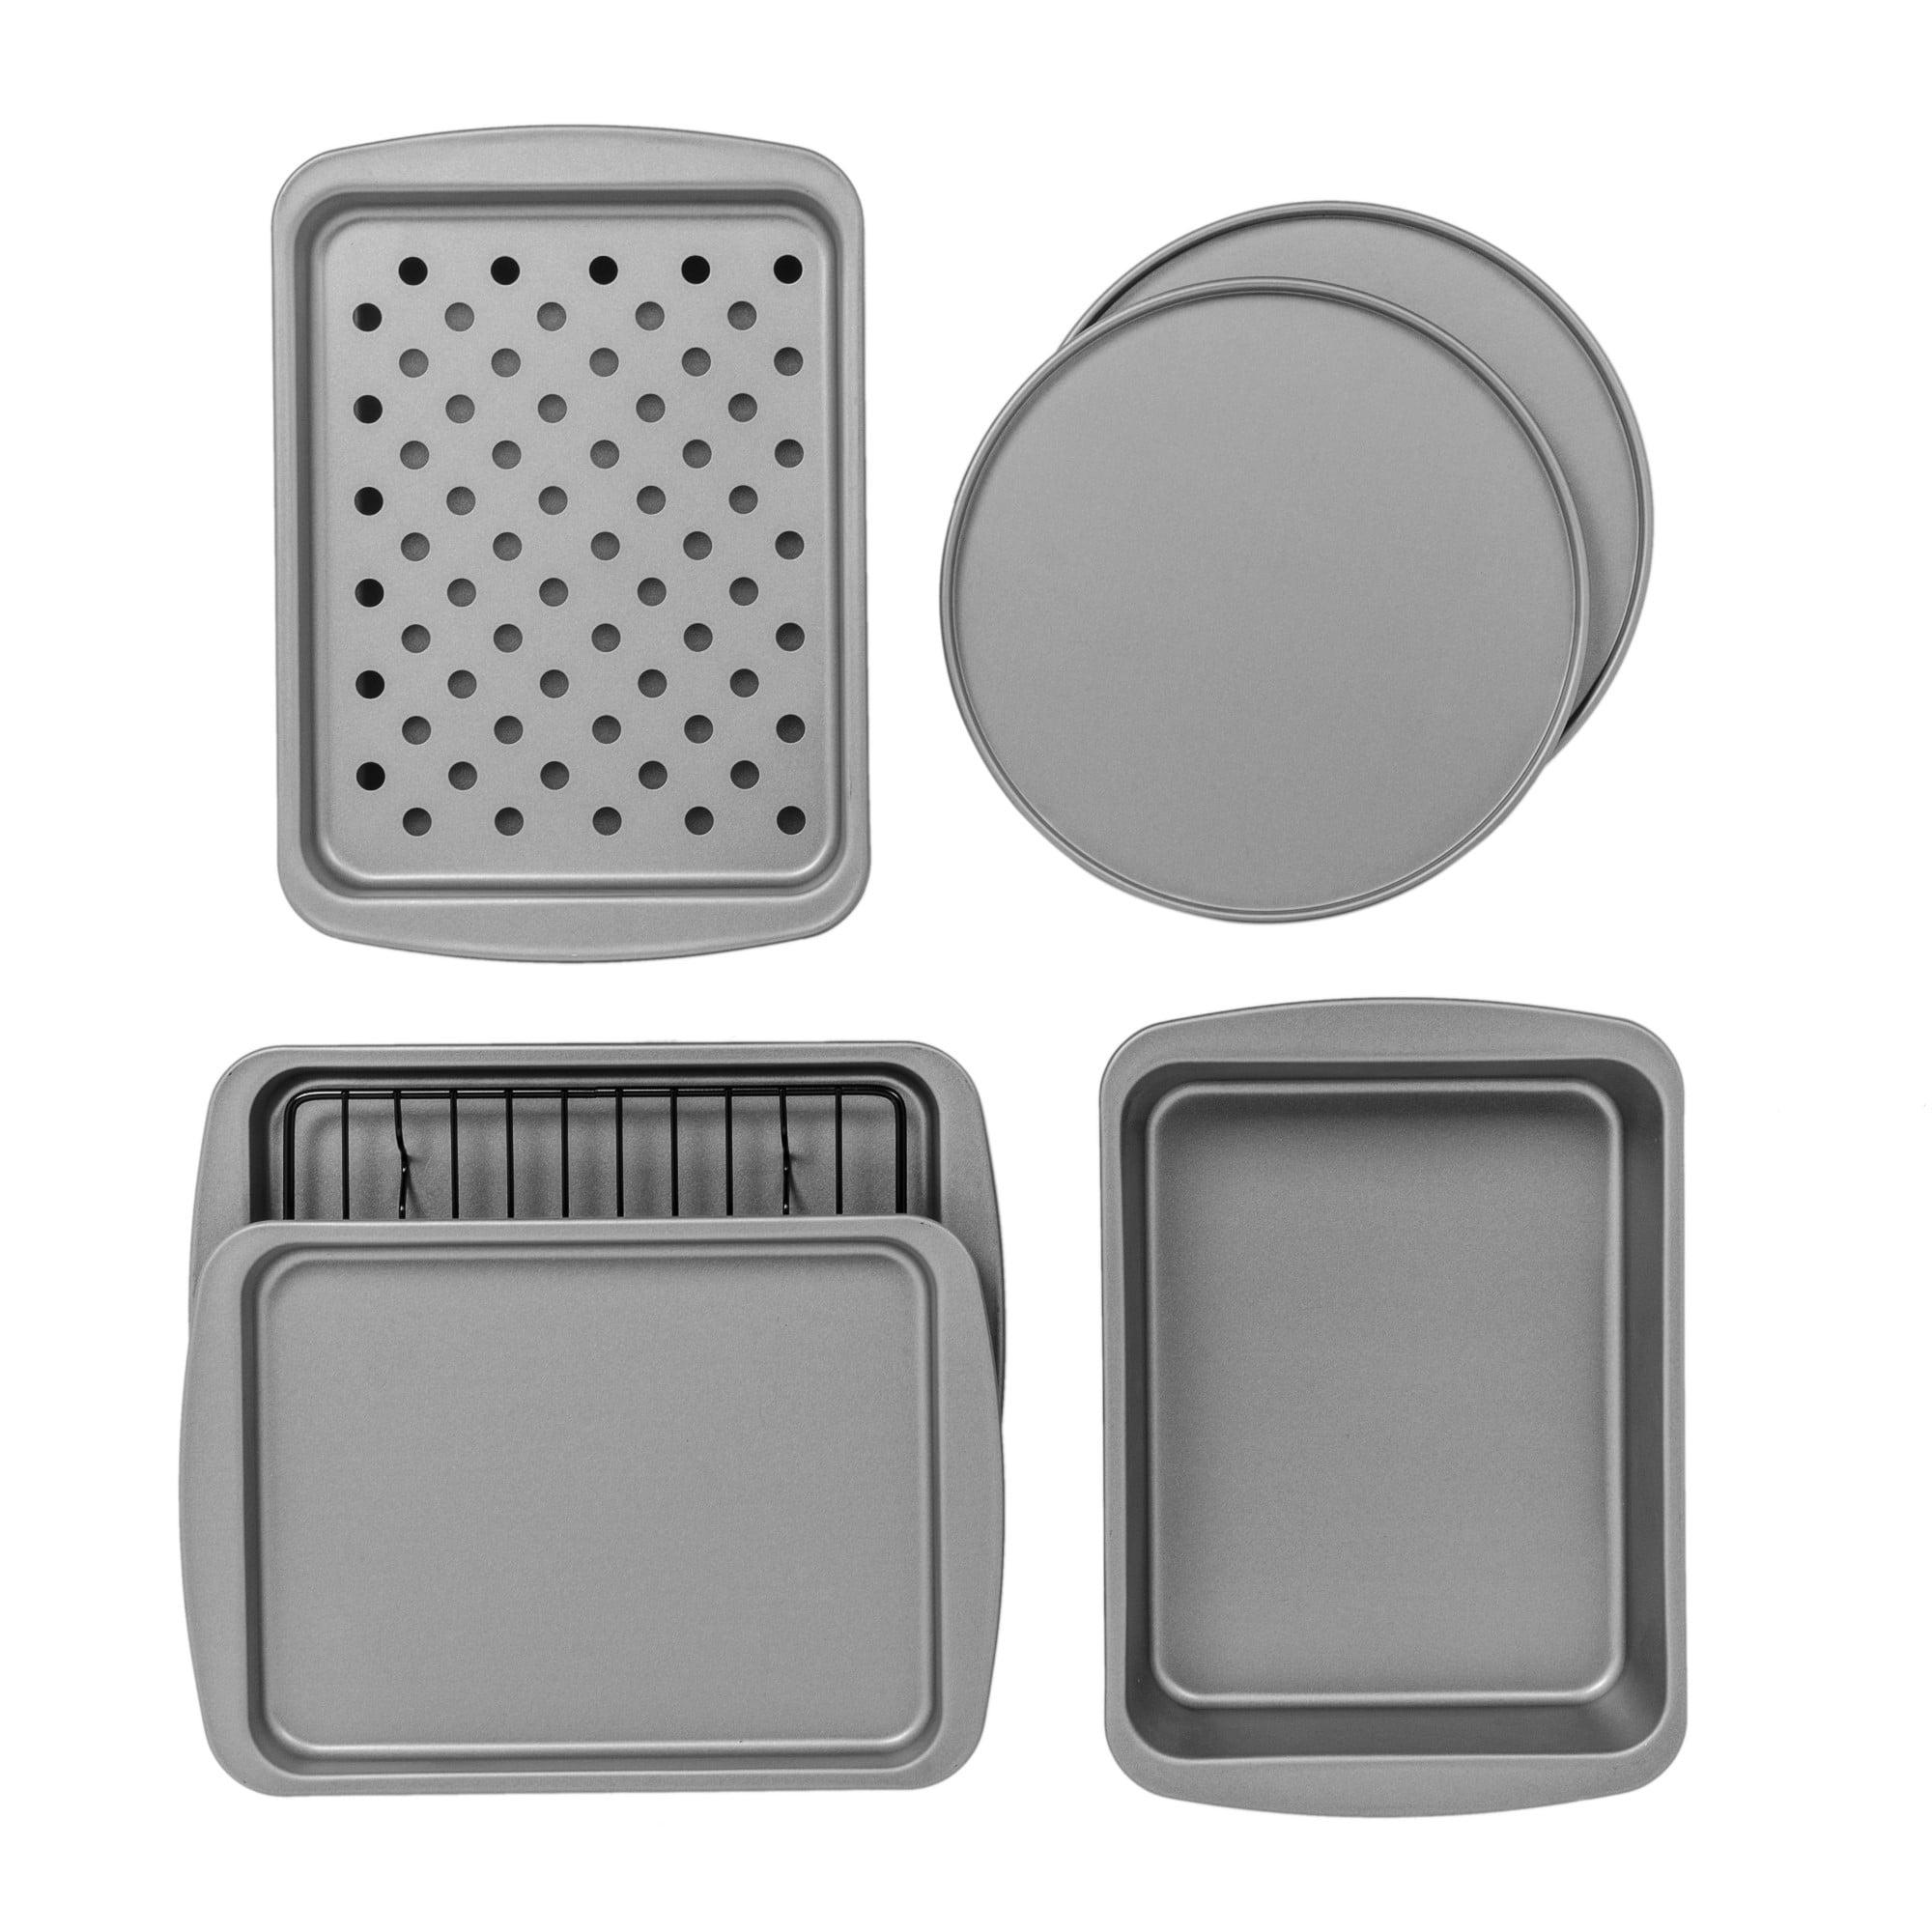 BakerEze 8Piece Nonstick Toaster Oven Bakeware Set Pizza Pan